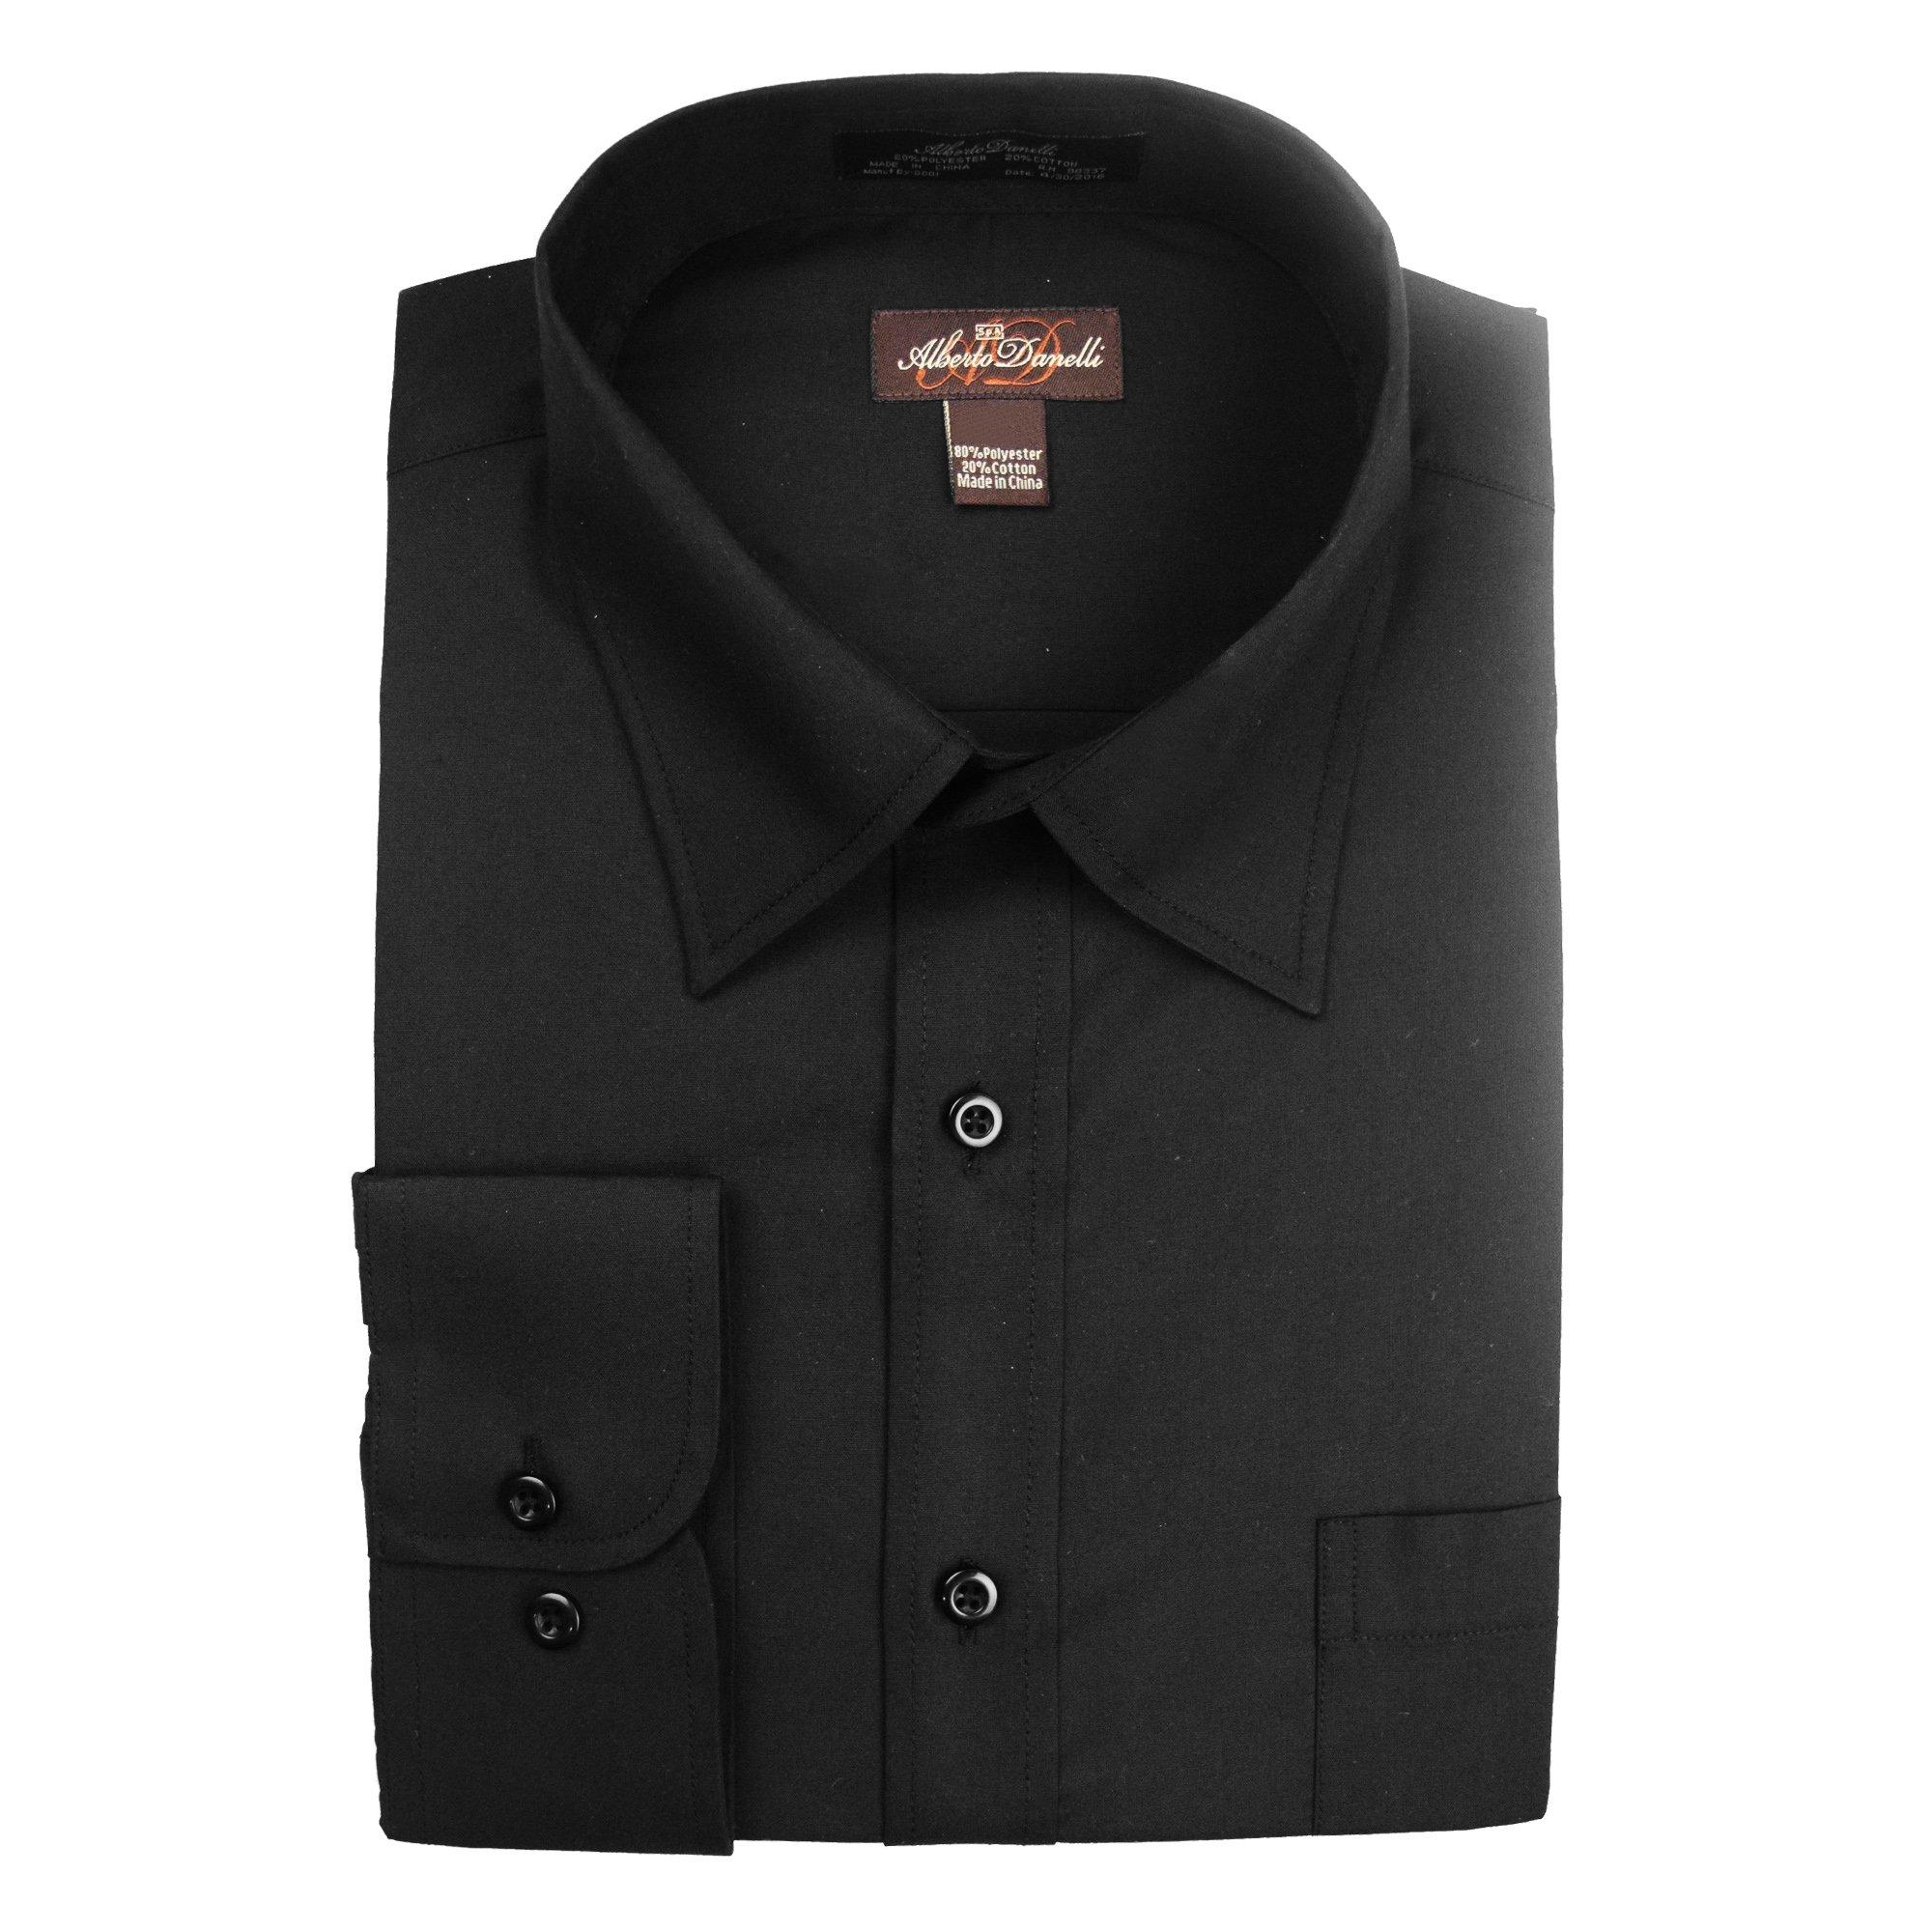 Alberto Danelli Men's Solid Long Sleeve Dress Shirt, Black, Medium / 15-15.5'' Neck, 33/34'' Sleeve